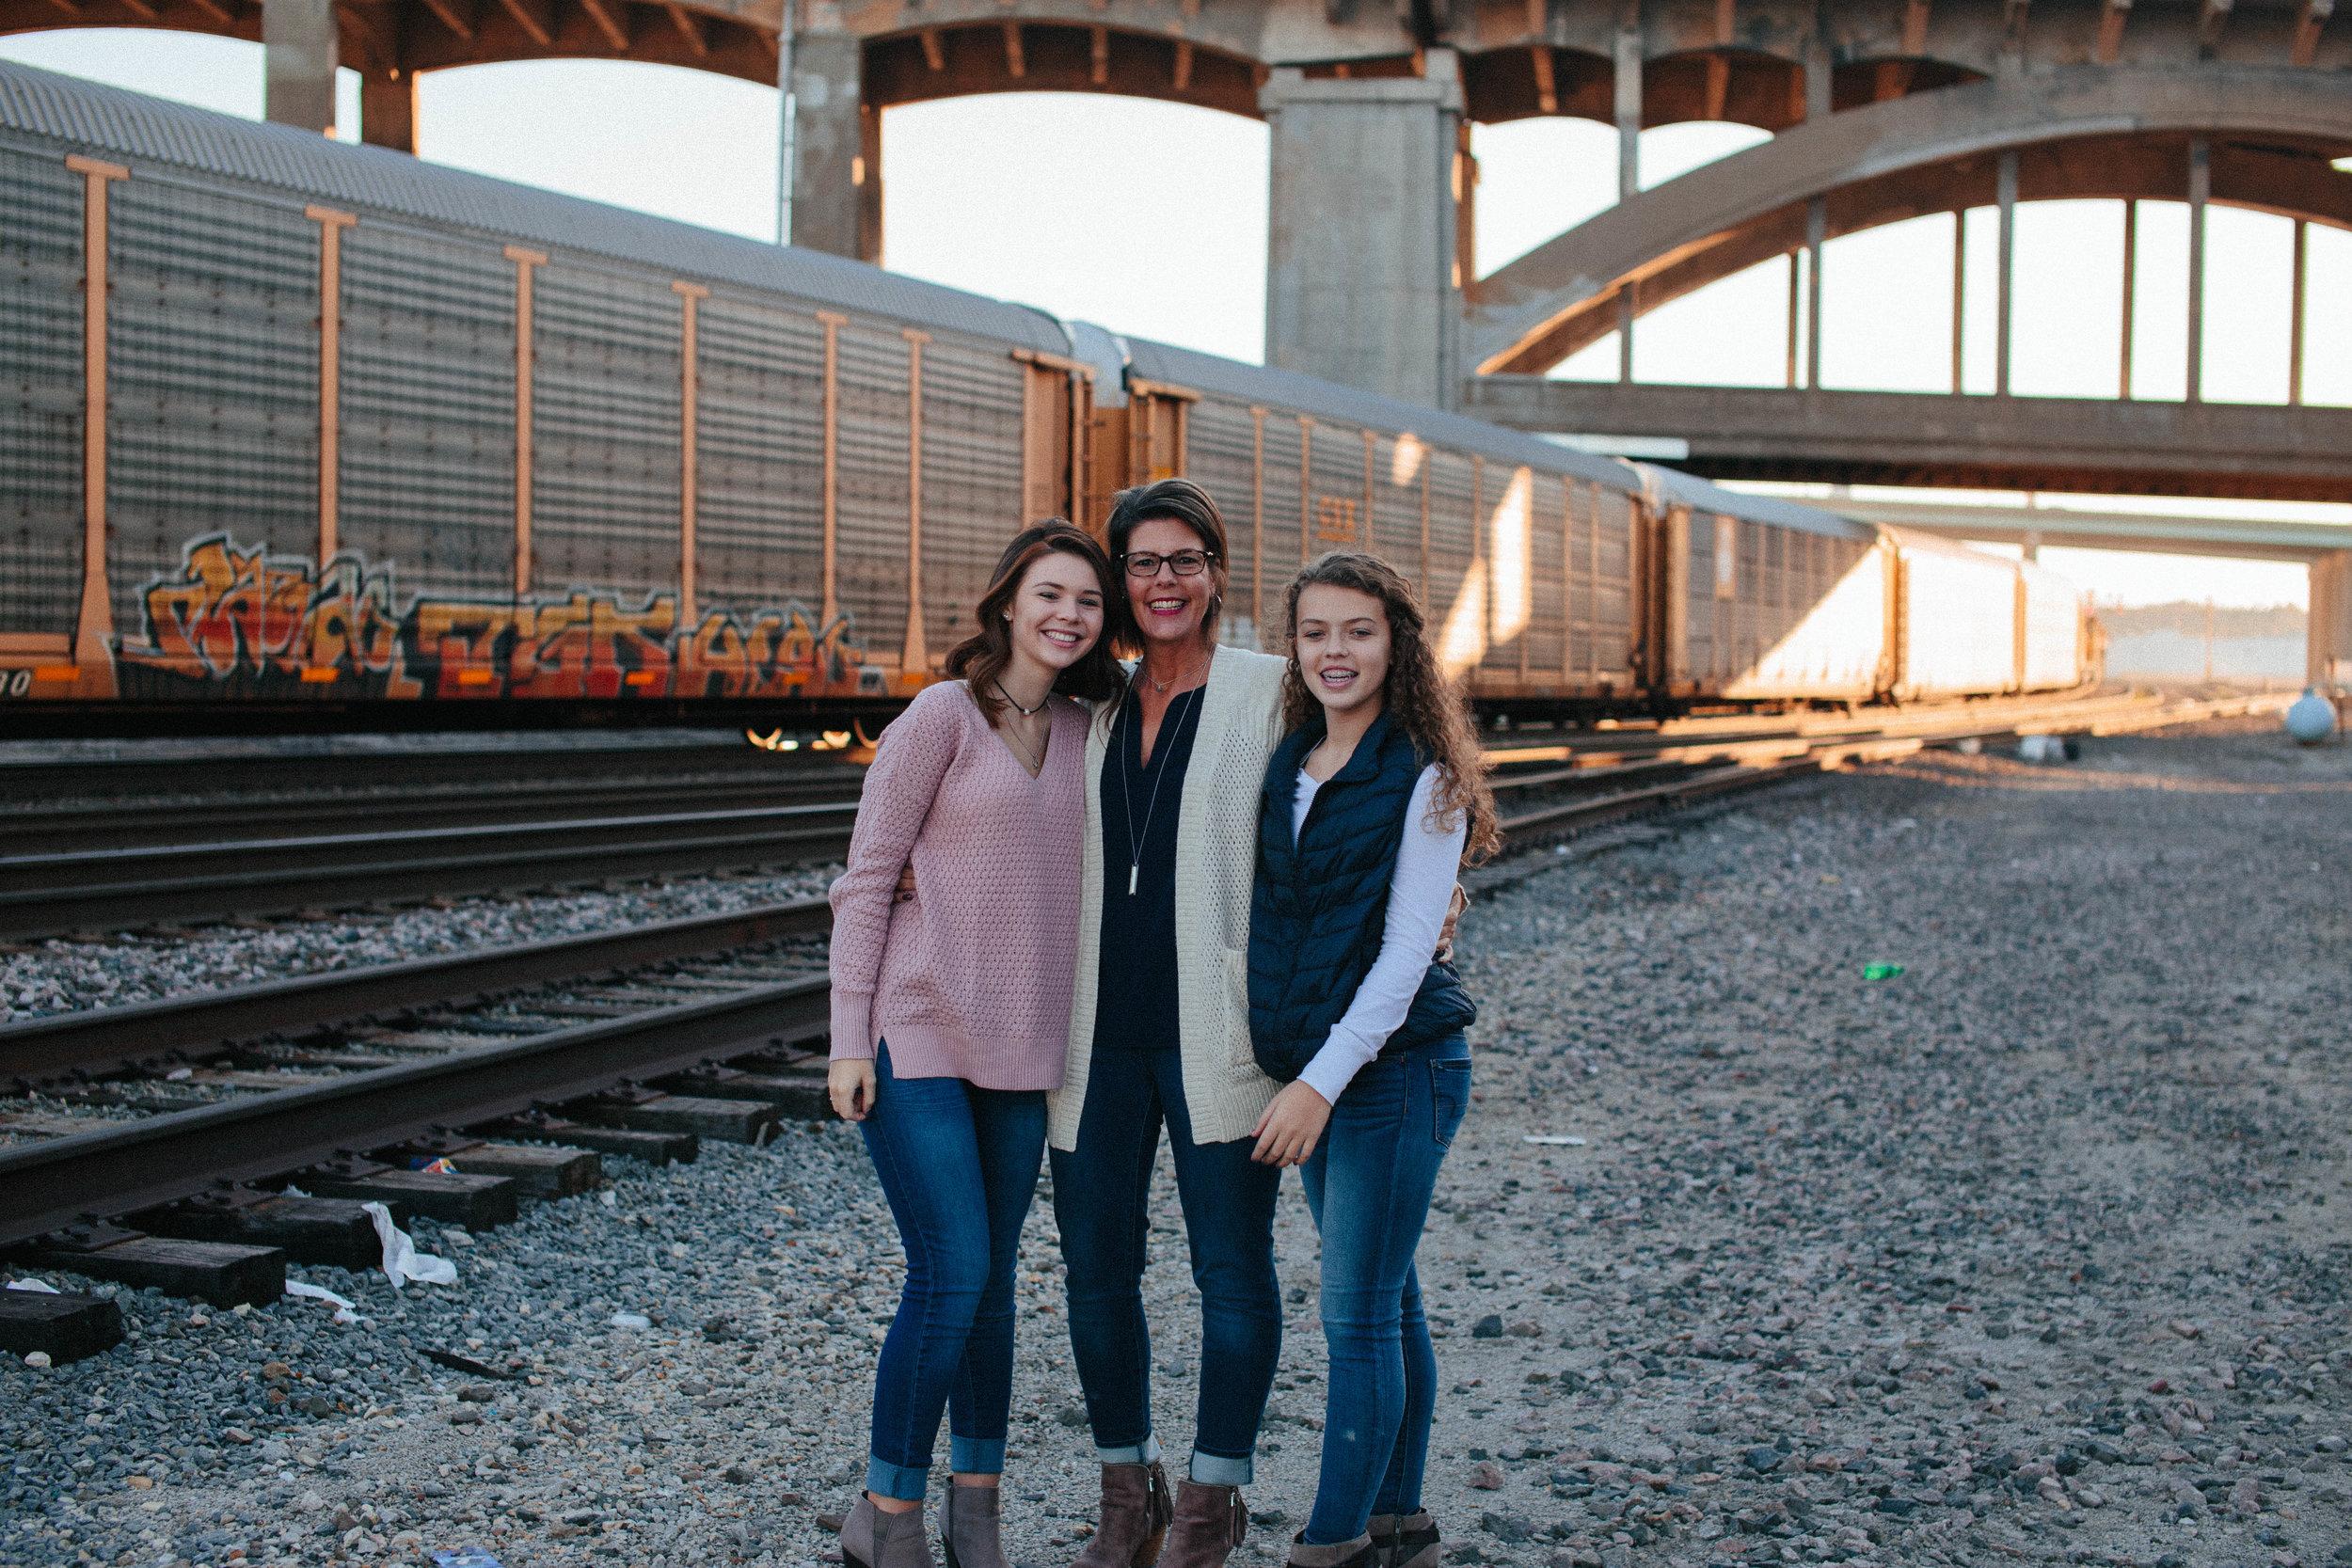 The britt-blevins Family | Hannahill Photography | Kansas City, MO